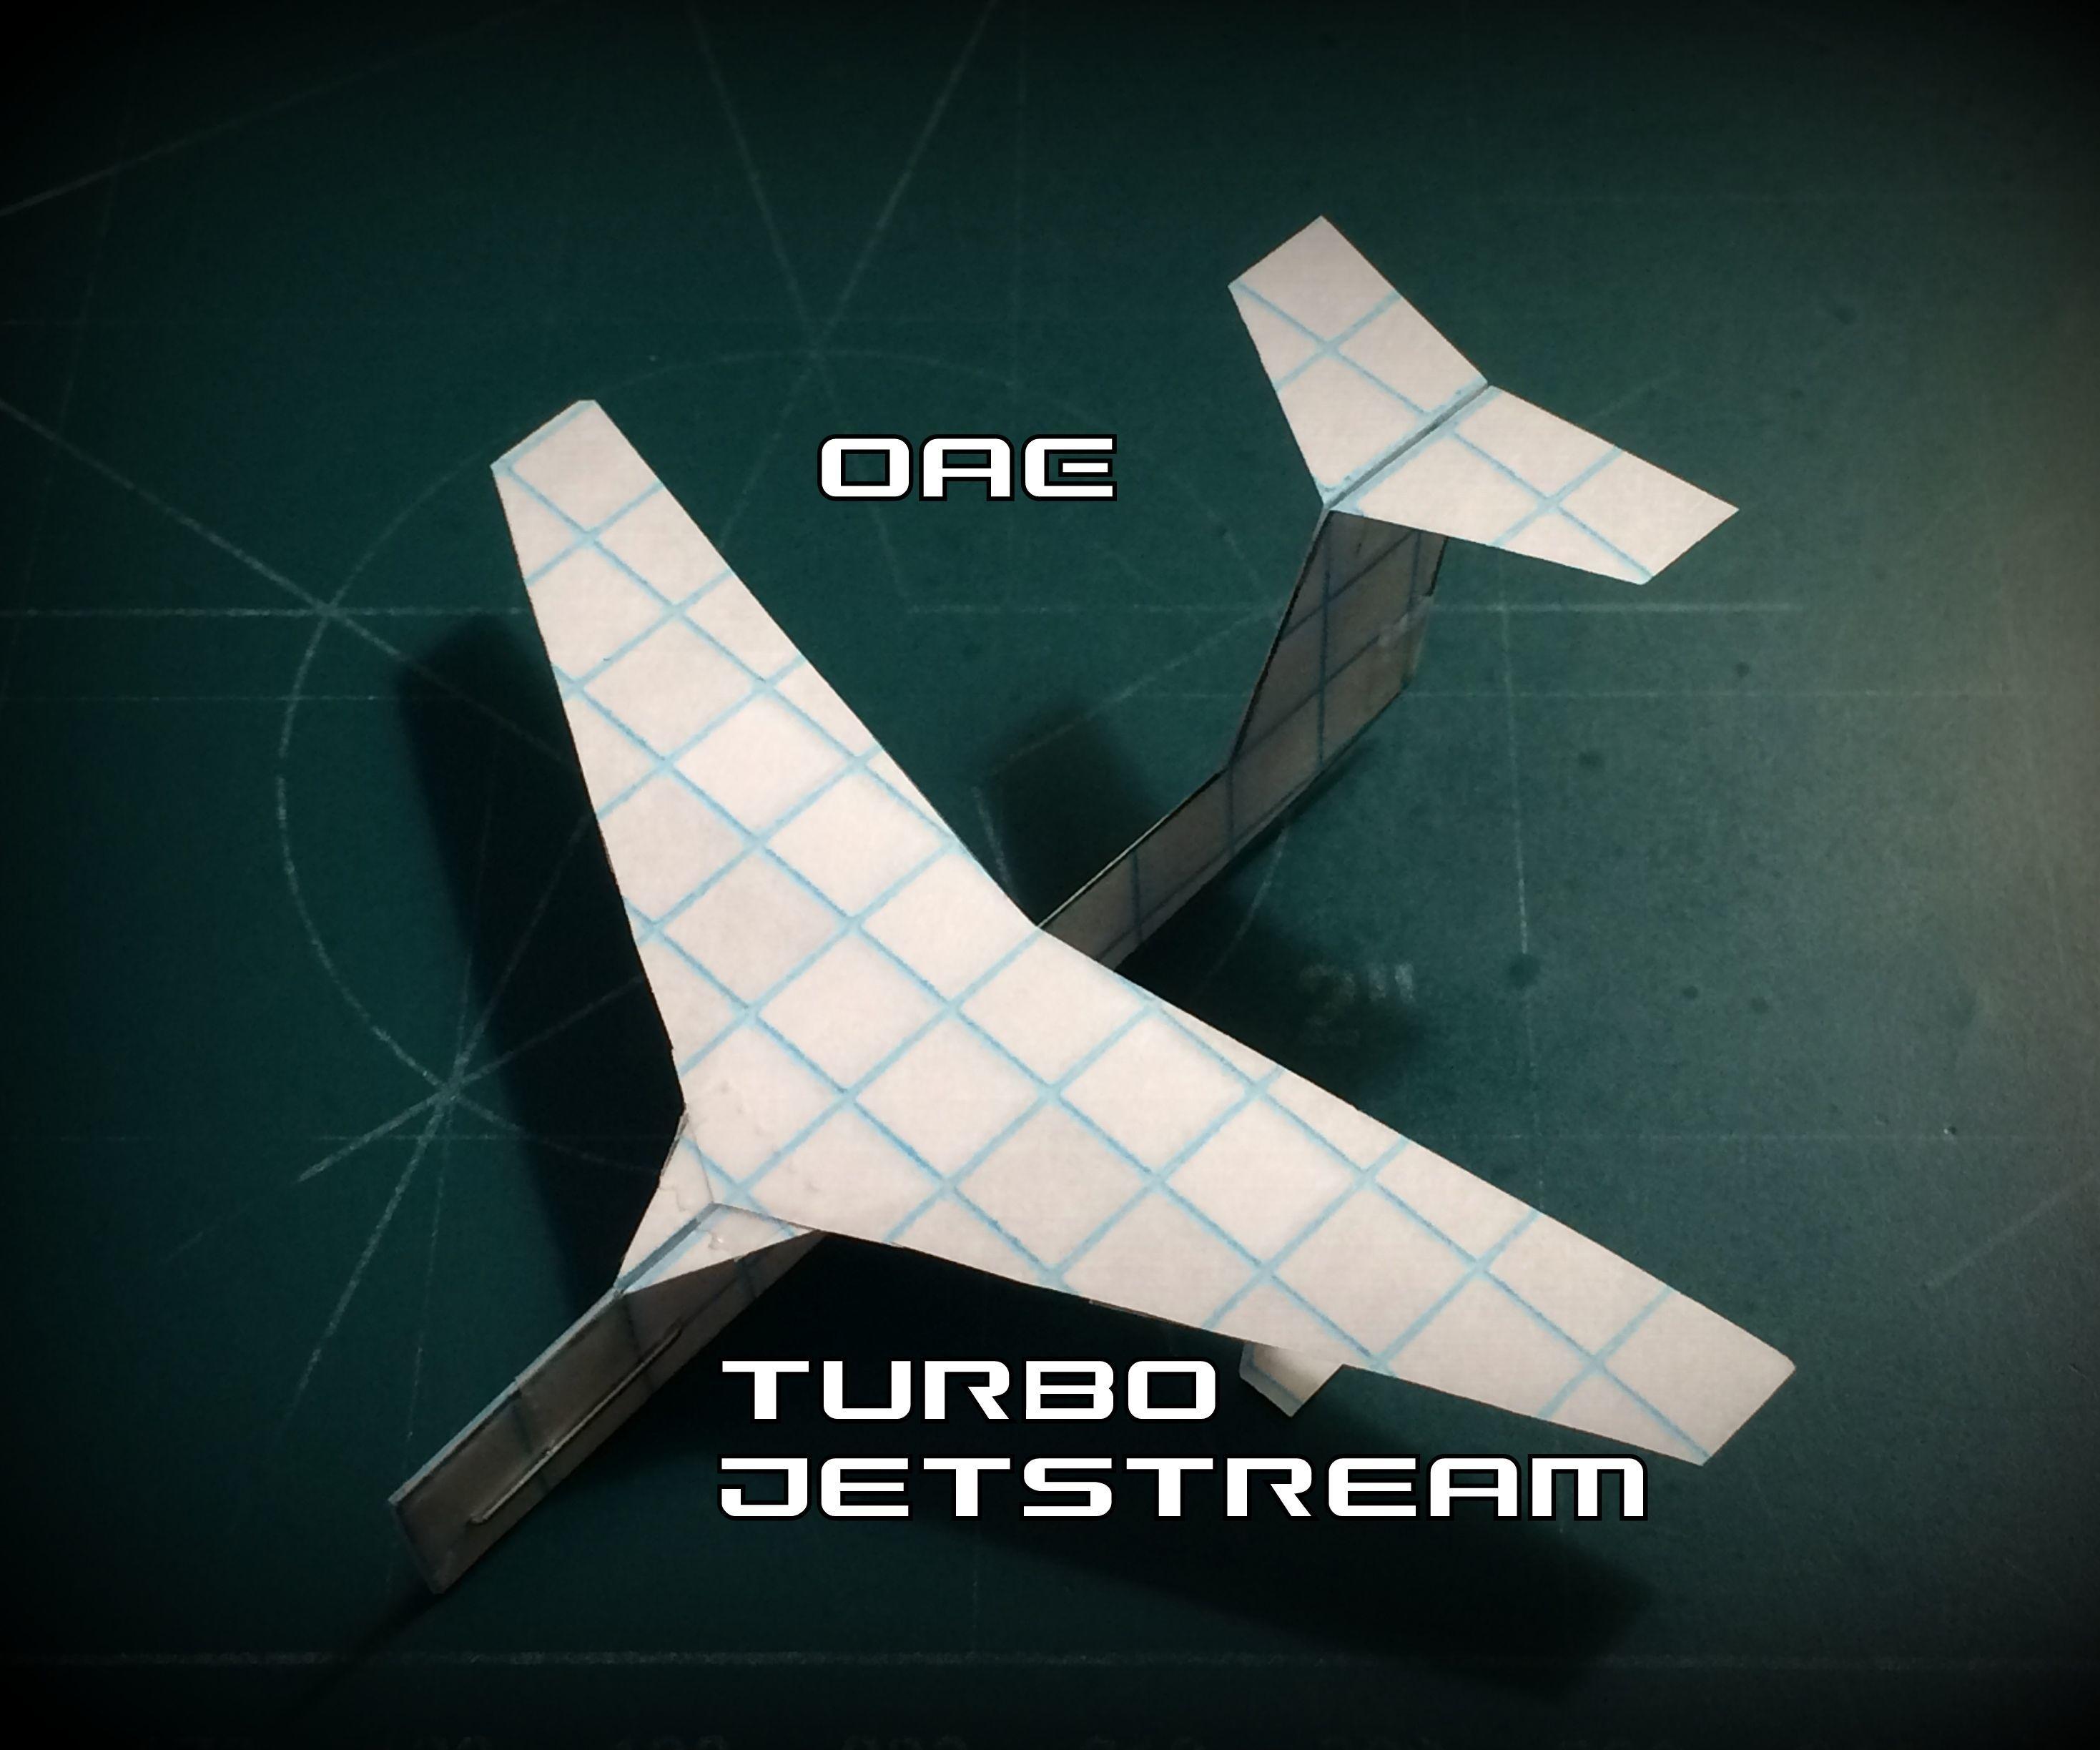 How to Make the Turbo Jetstream Paper Airplane